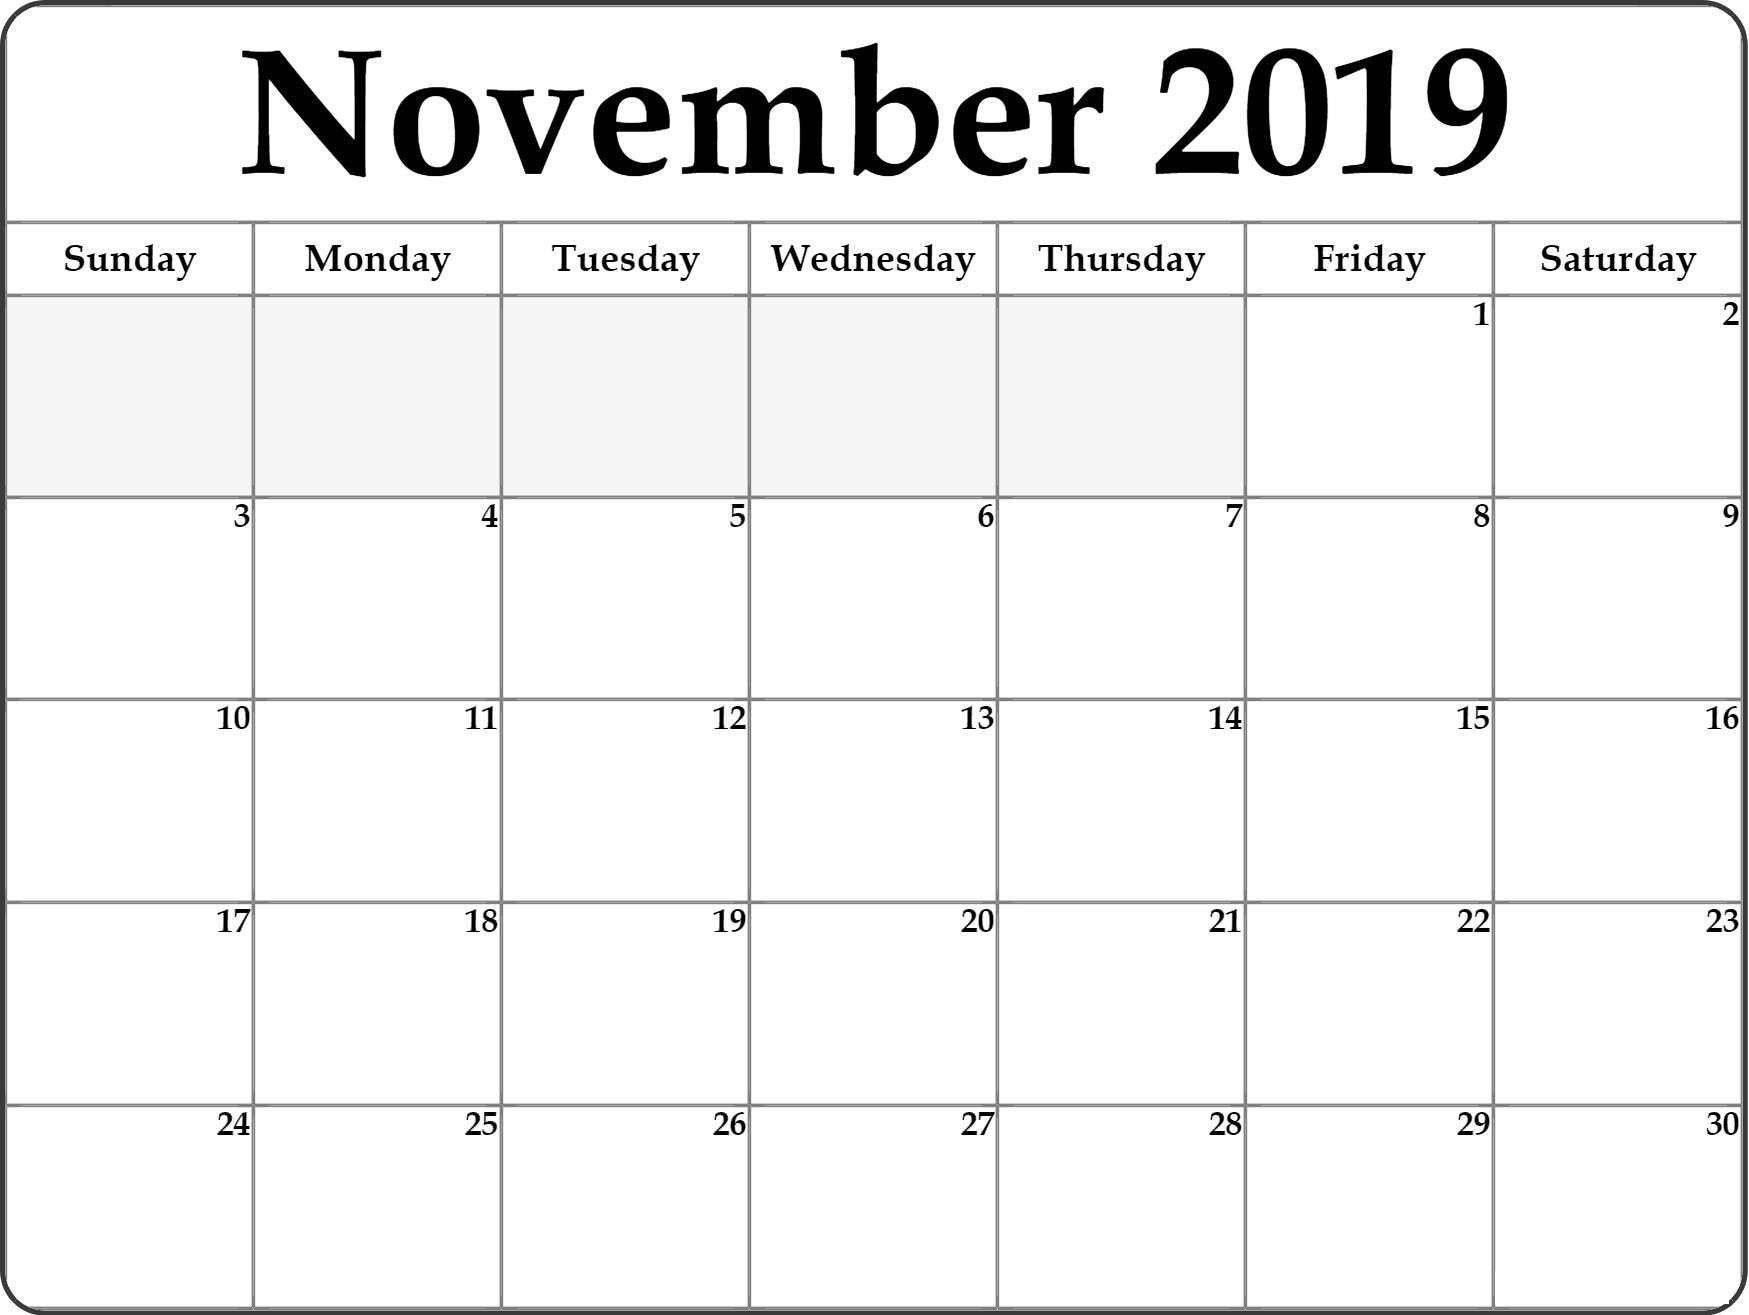 Blank November 2019 Calendar Large Print - Free August 2019